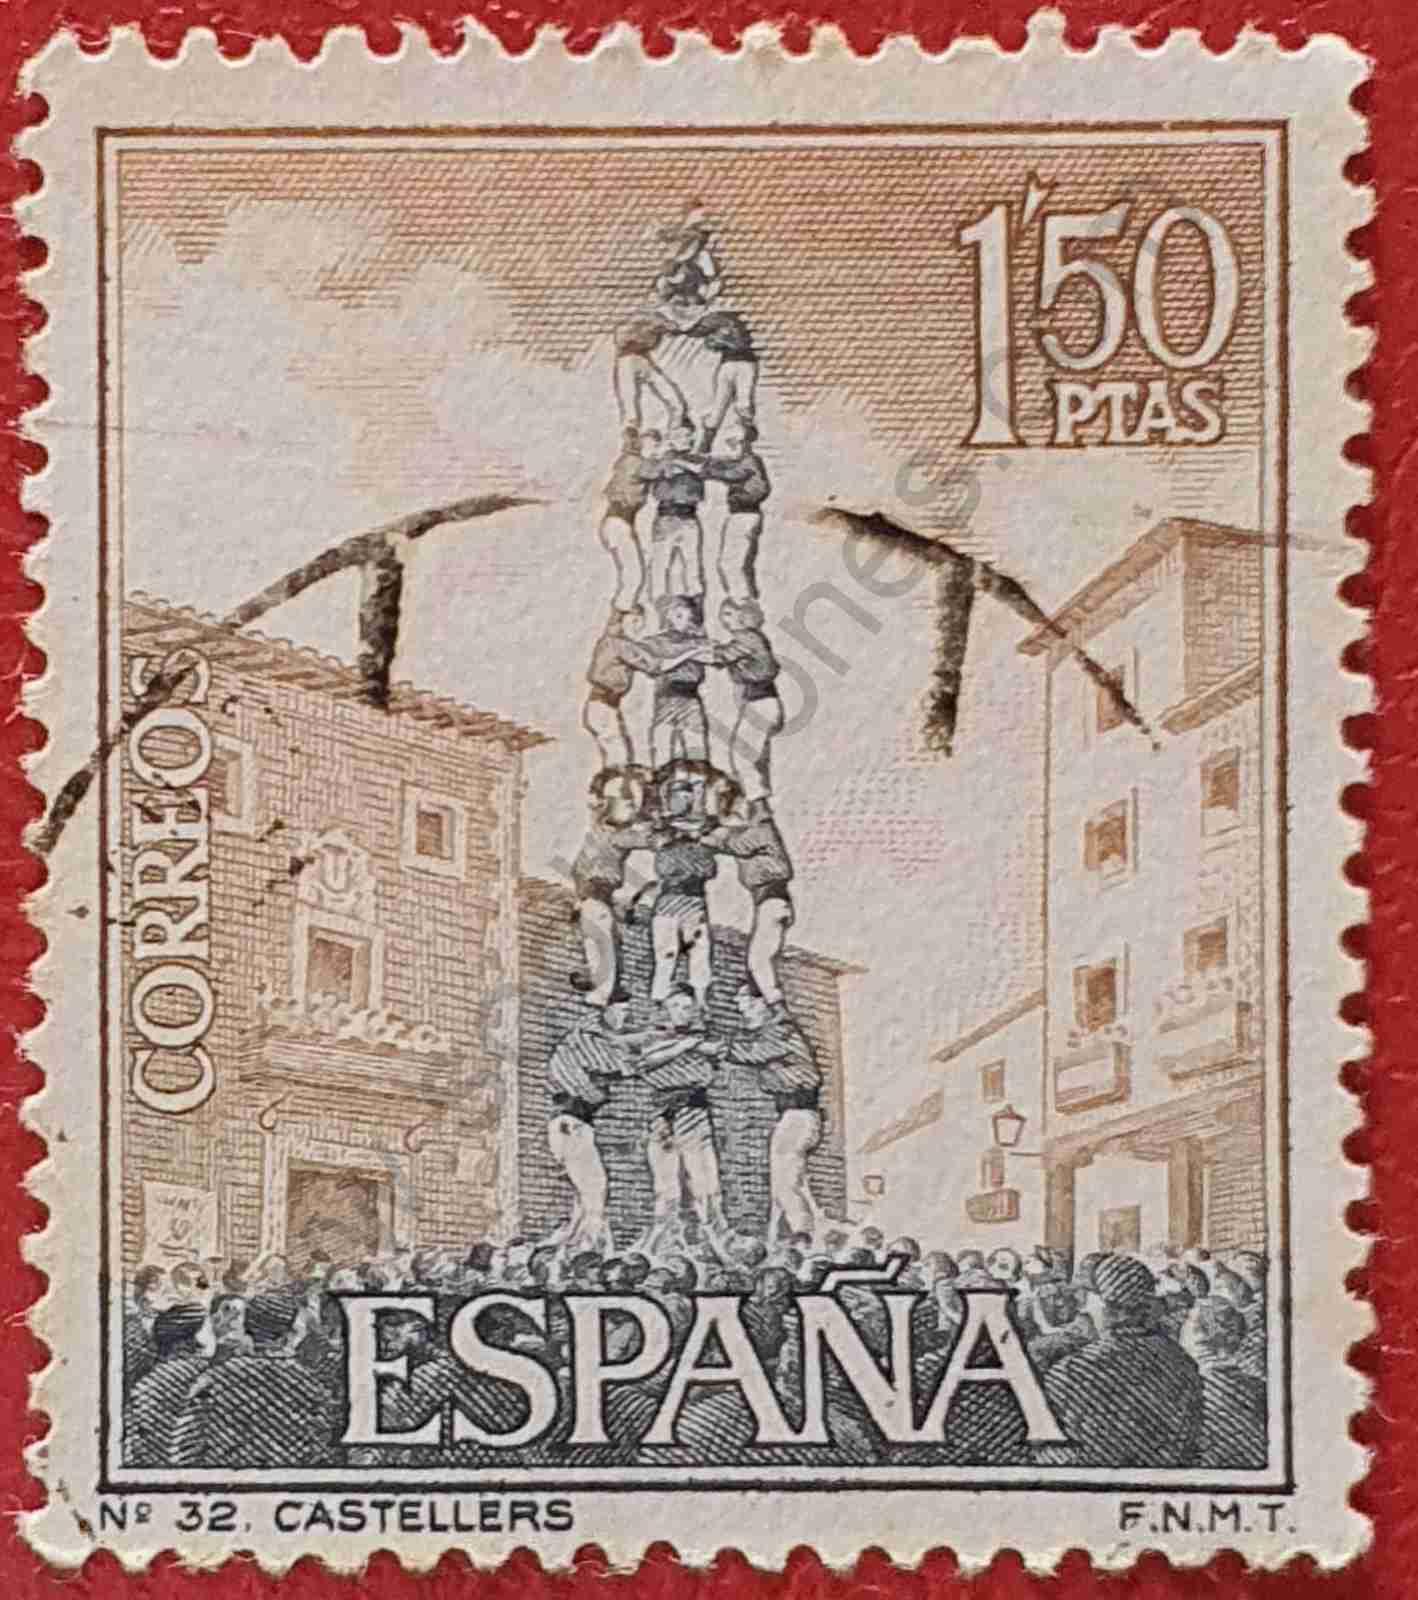 Sello Castellers - España 1967